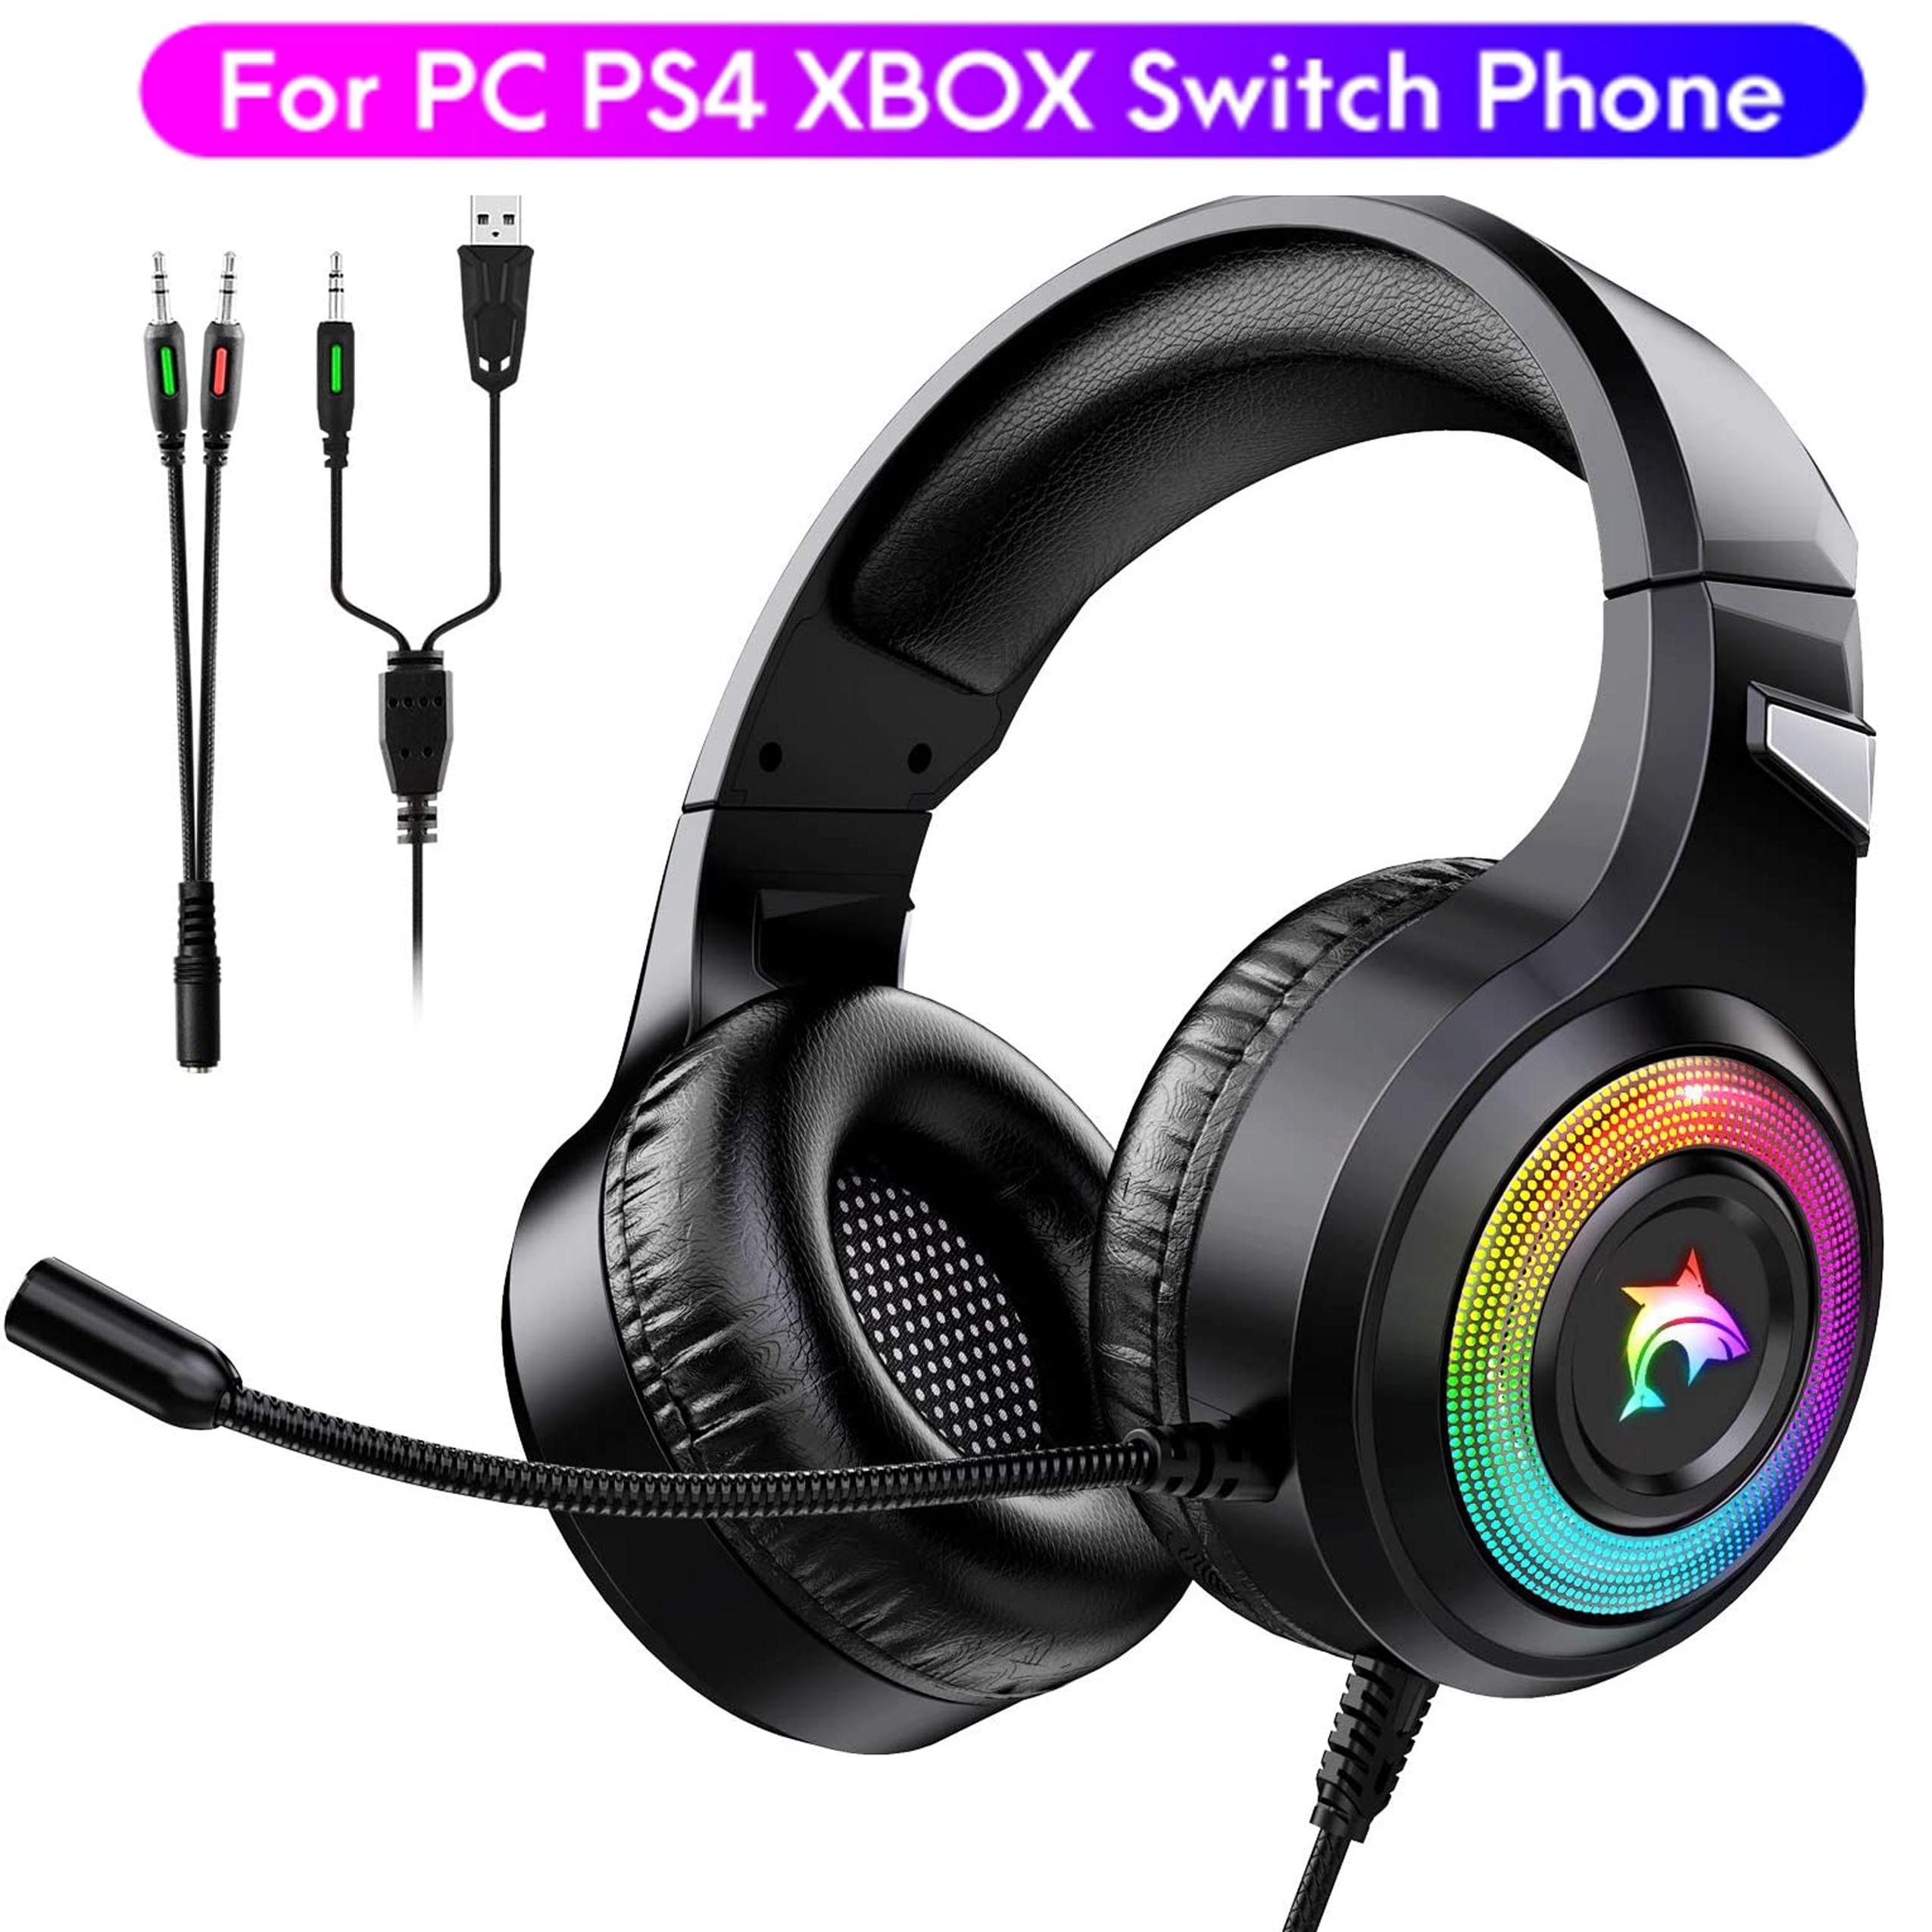 FUNINGEEK سماعة الألعاب Fone Gamer الإفراط في رئيس سماعة مع ميكروفون RGB التنفس ضوء سماعات أذن بأسلاك للكمبيوتر PS4 Xbox One